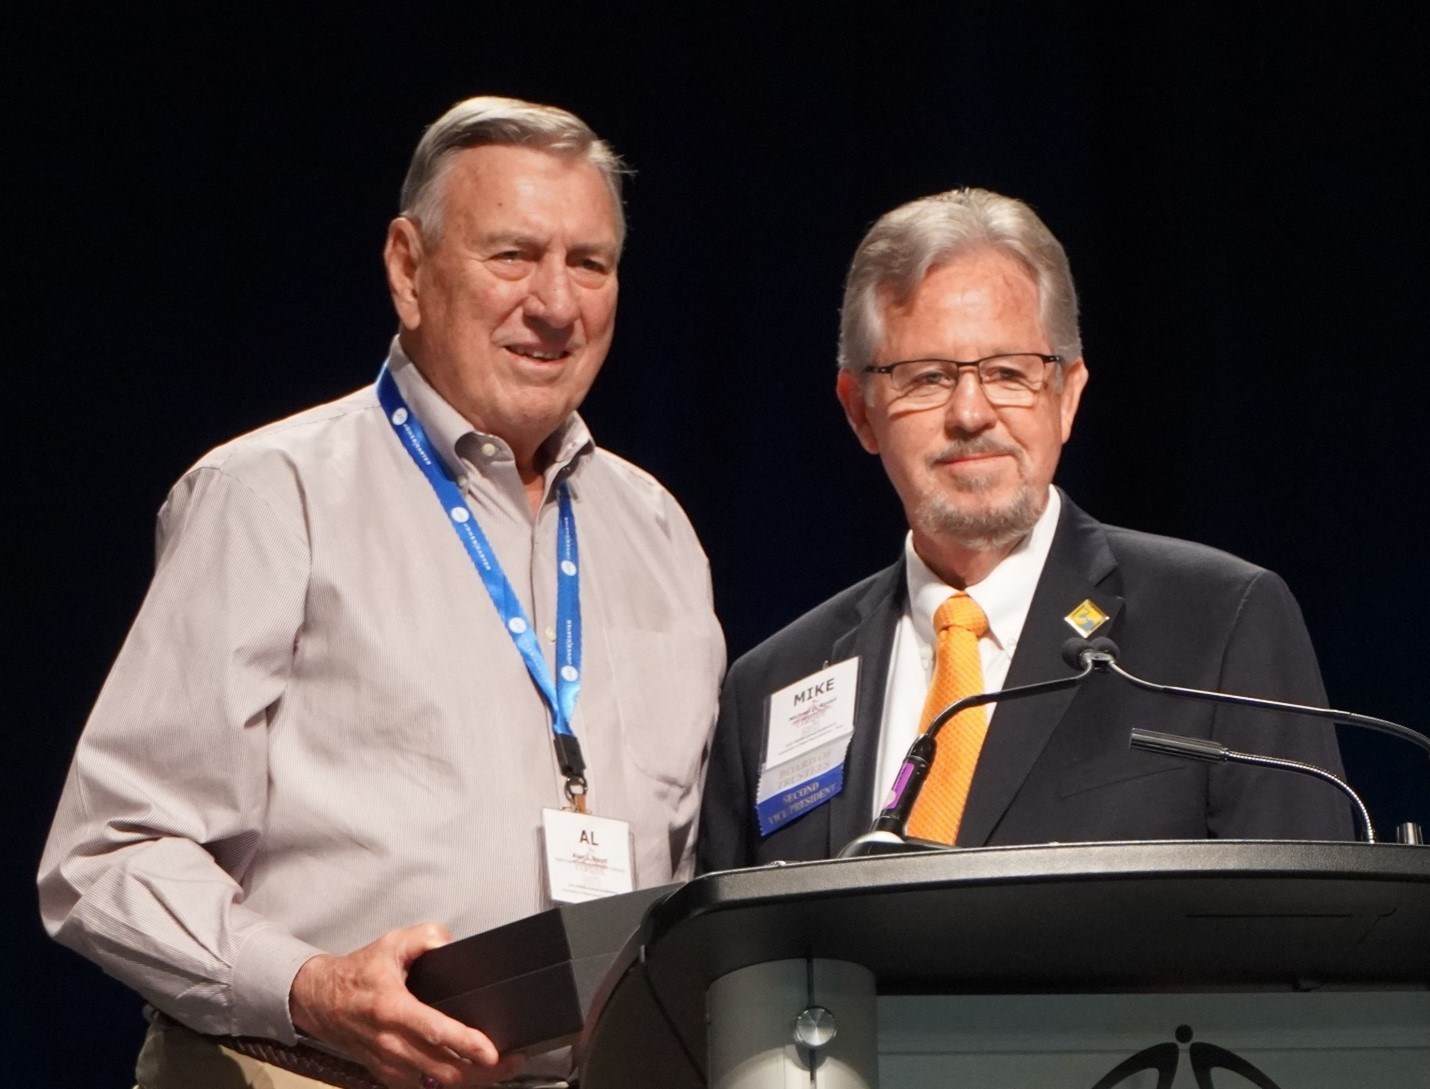 Al Rendl receives the prestigious AWBD VISIONS AWARD